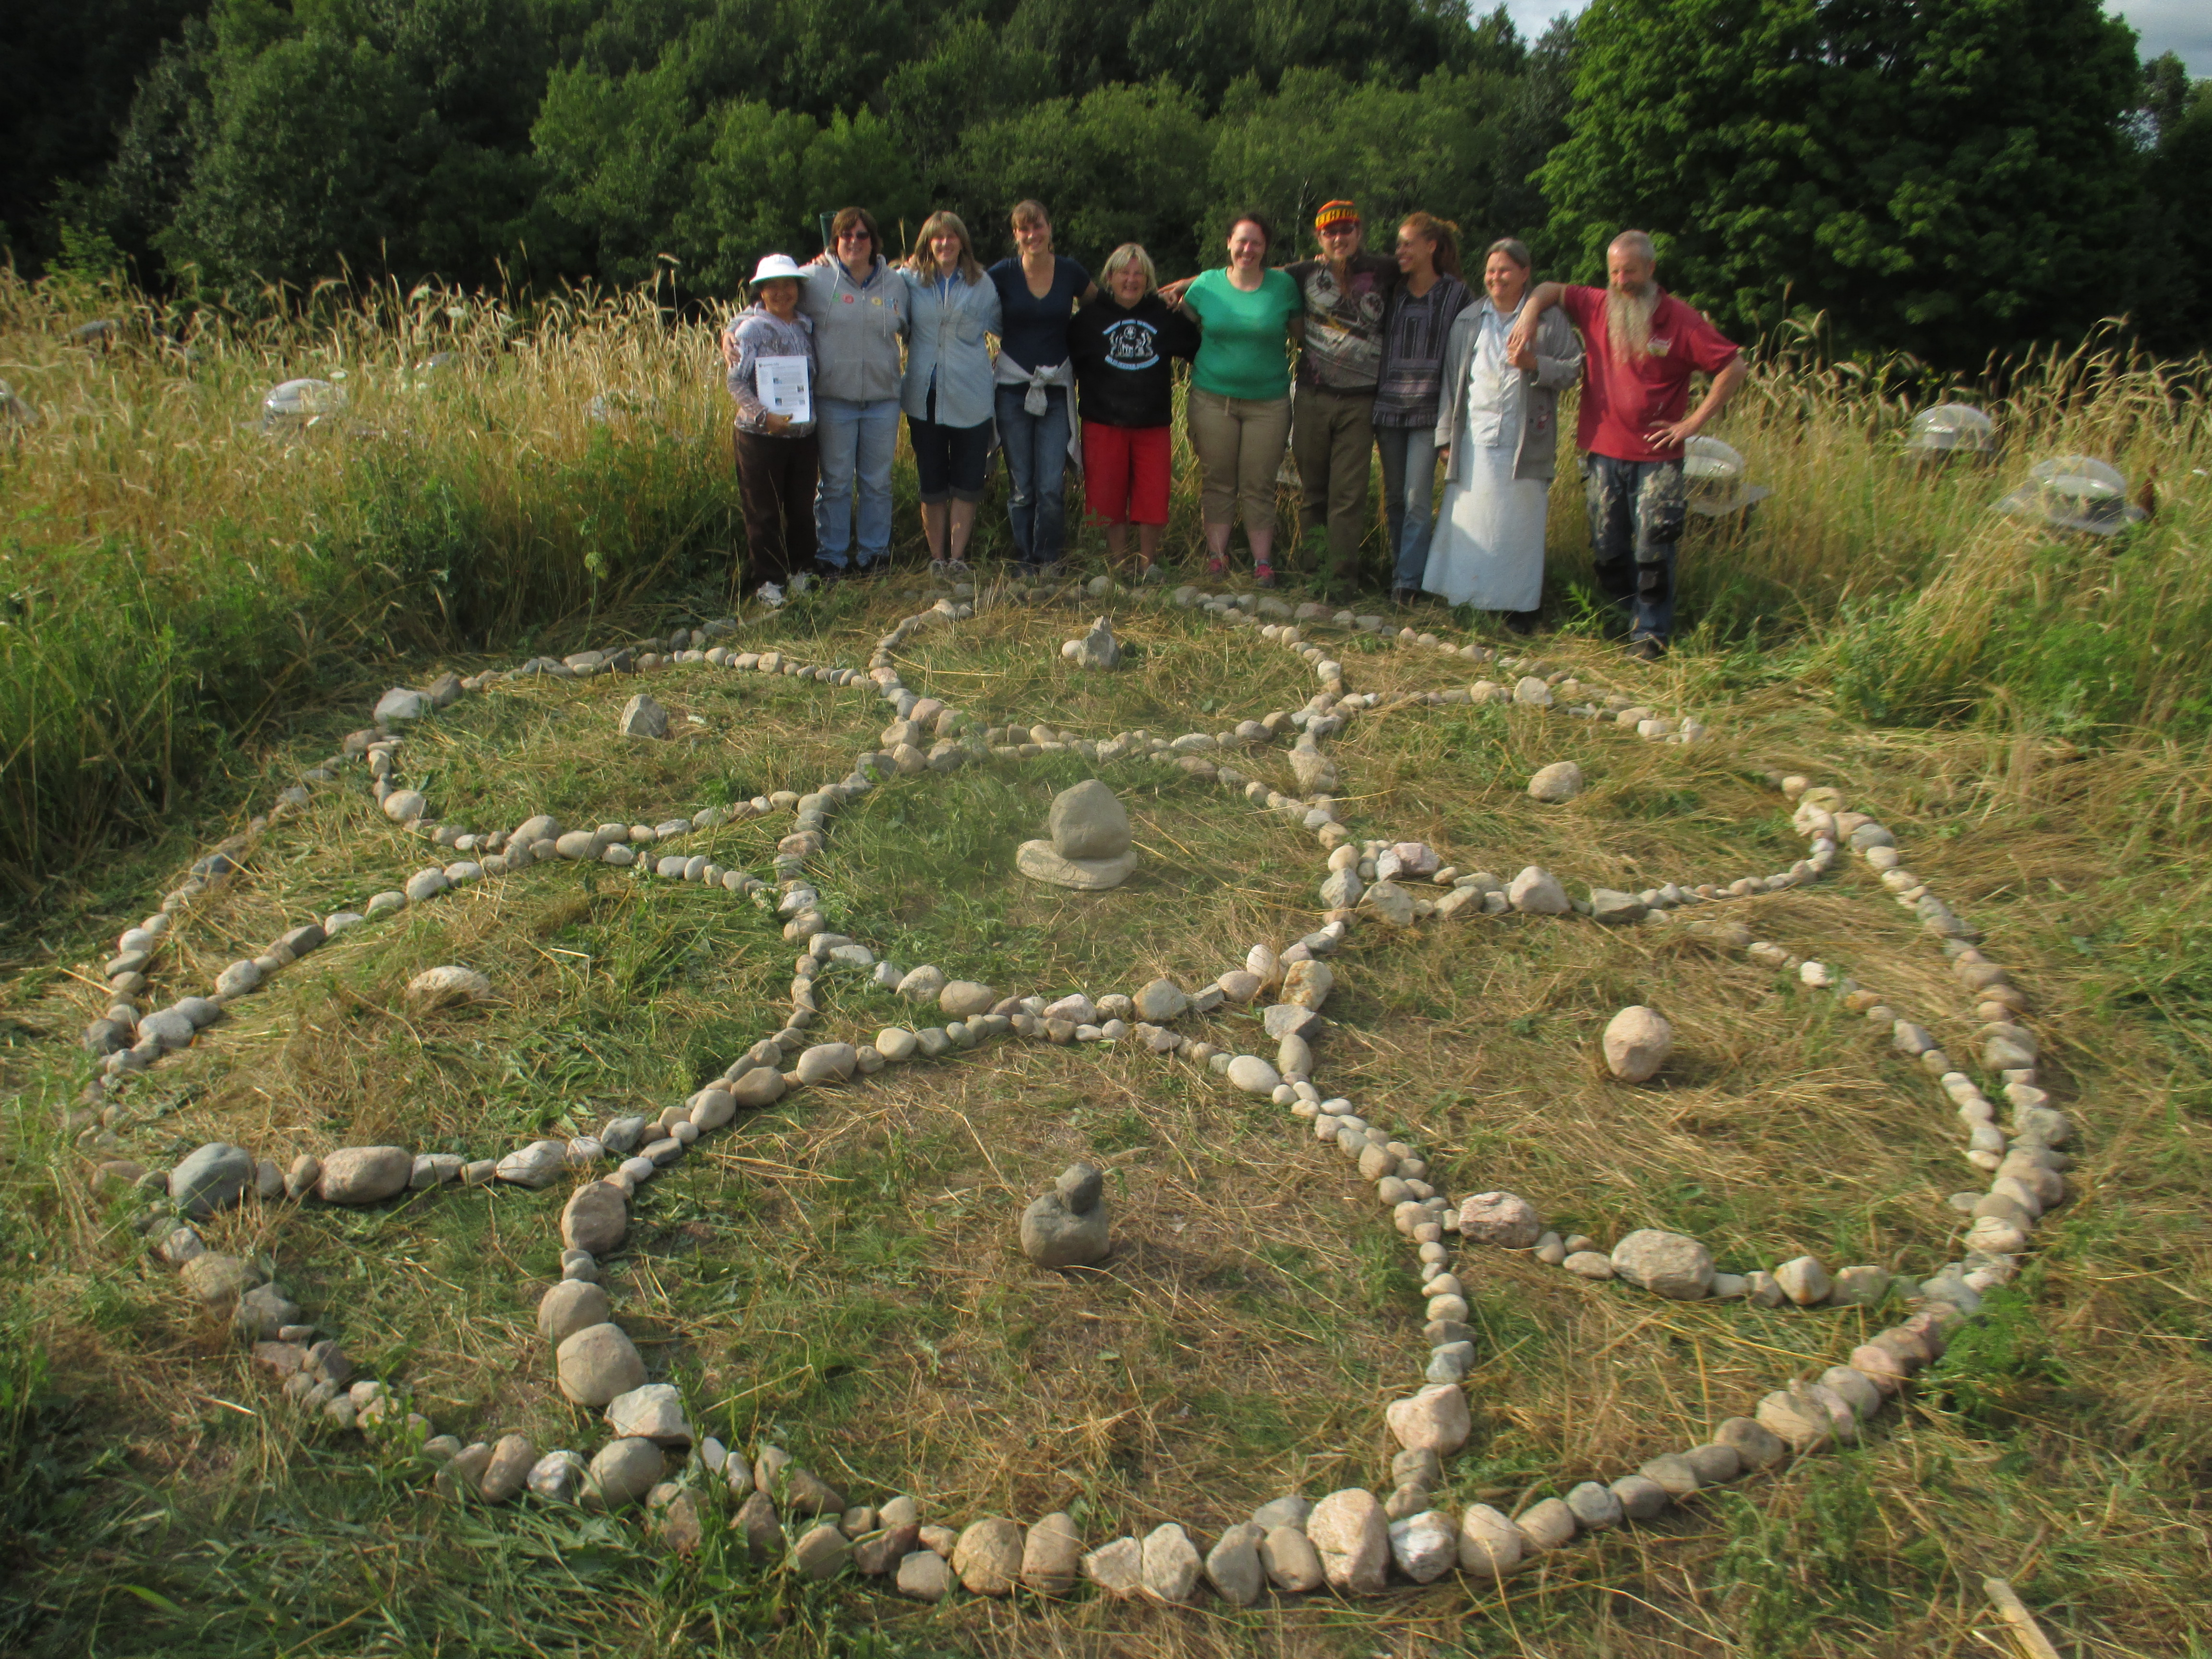 Sacred Circle on the Barn Roof!